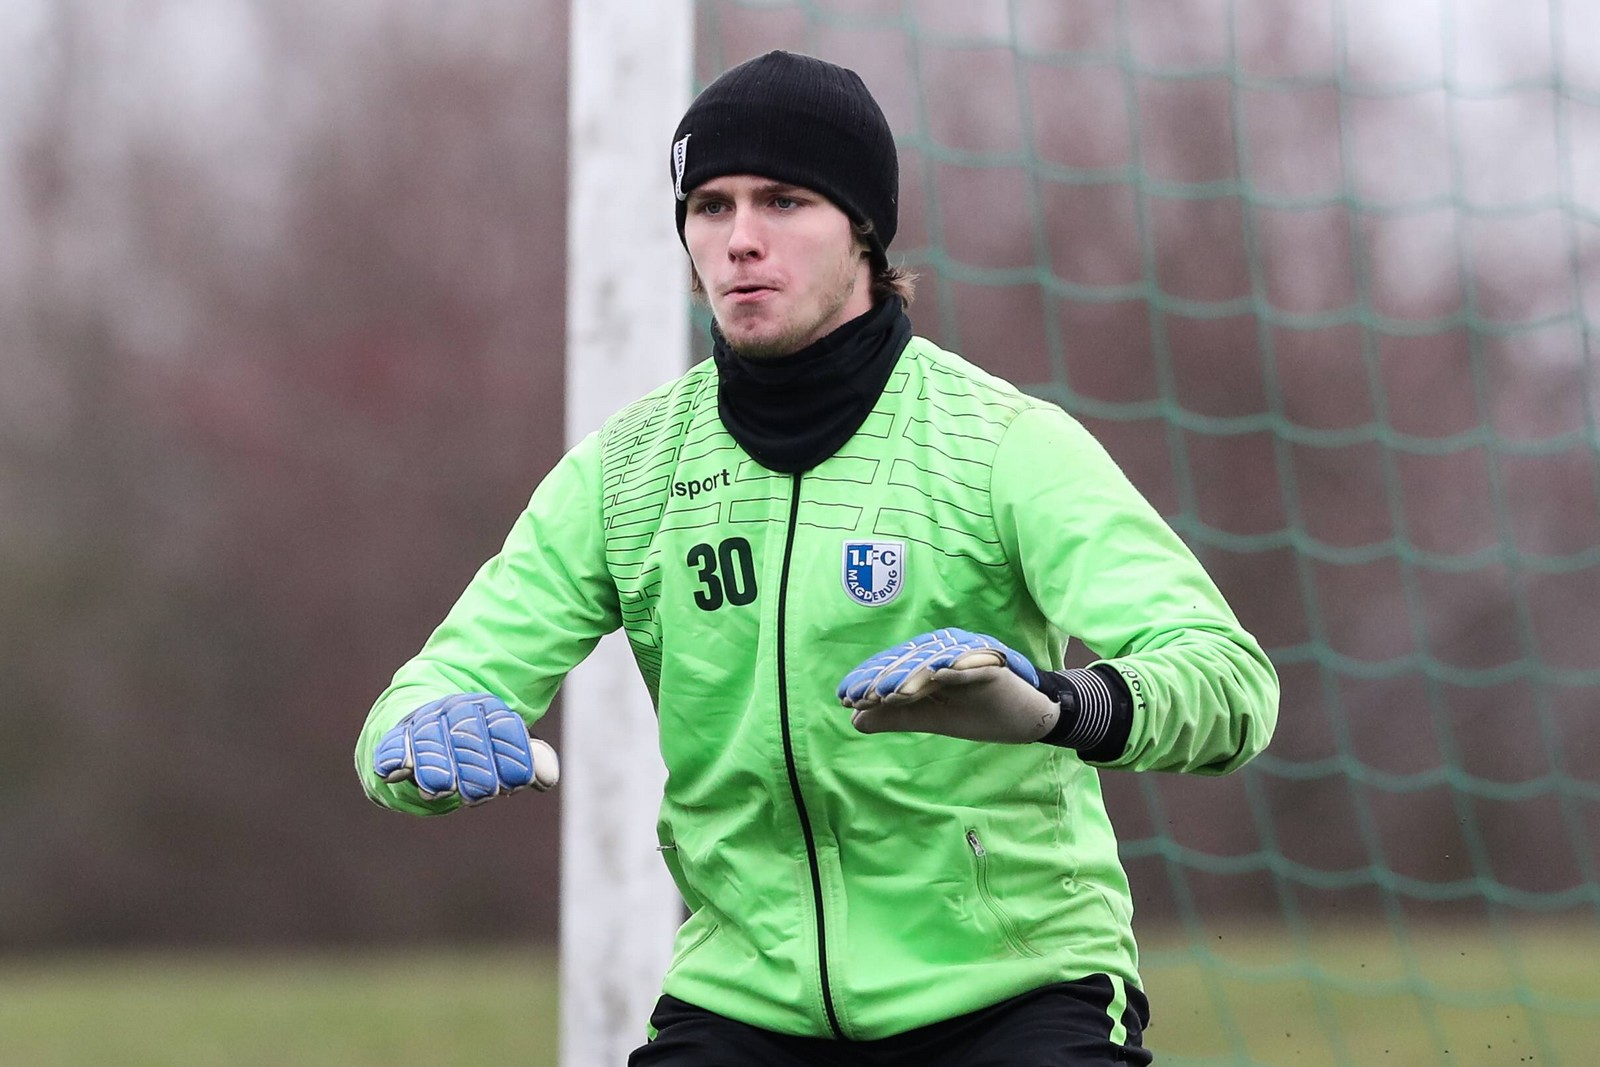 Tim Kips vom 1. FC Magdeburg